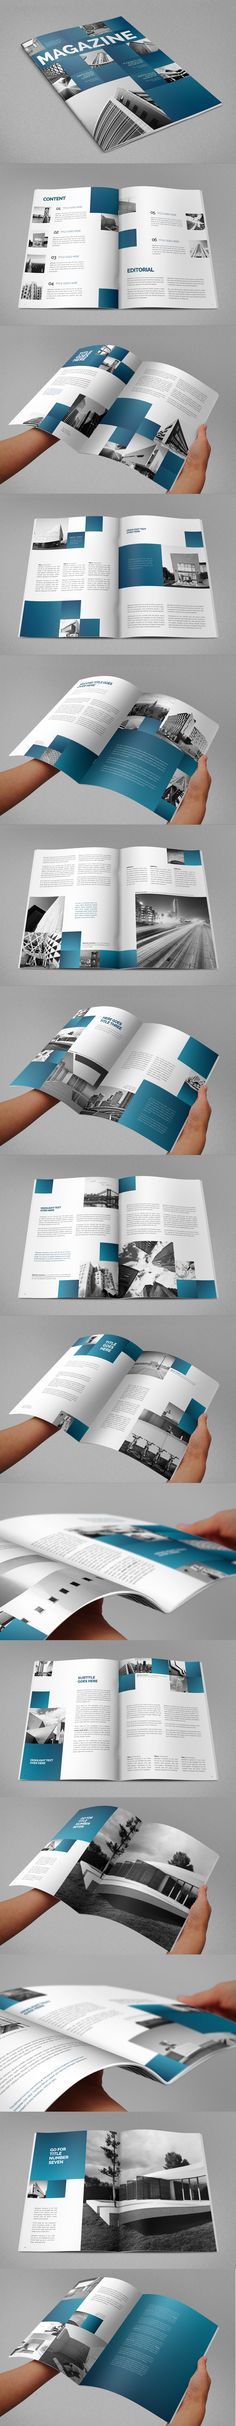 Architecture Squares Magazine. Download here: http://graphicriver.net/item/architecture-squares-magazine/8465426?ref=abradesign